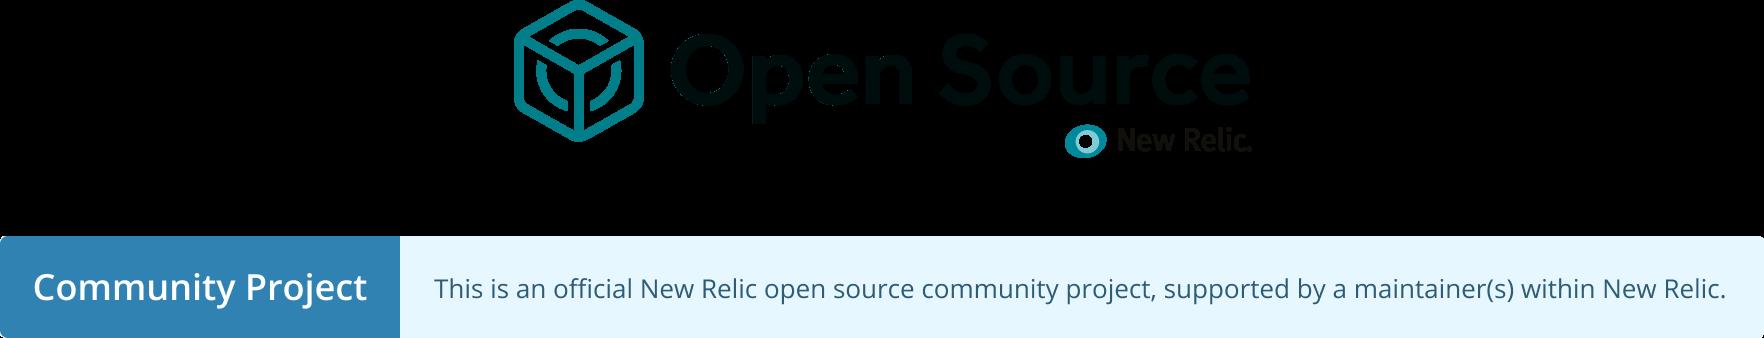 Community Project header